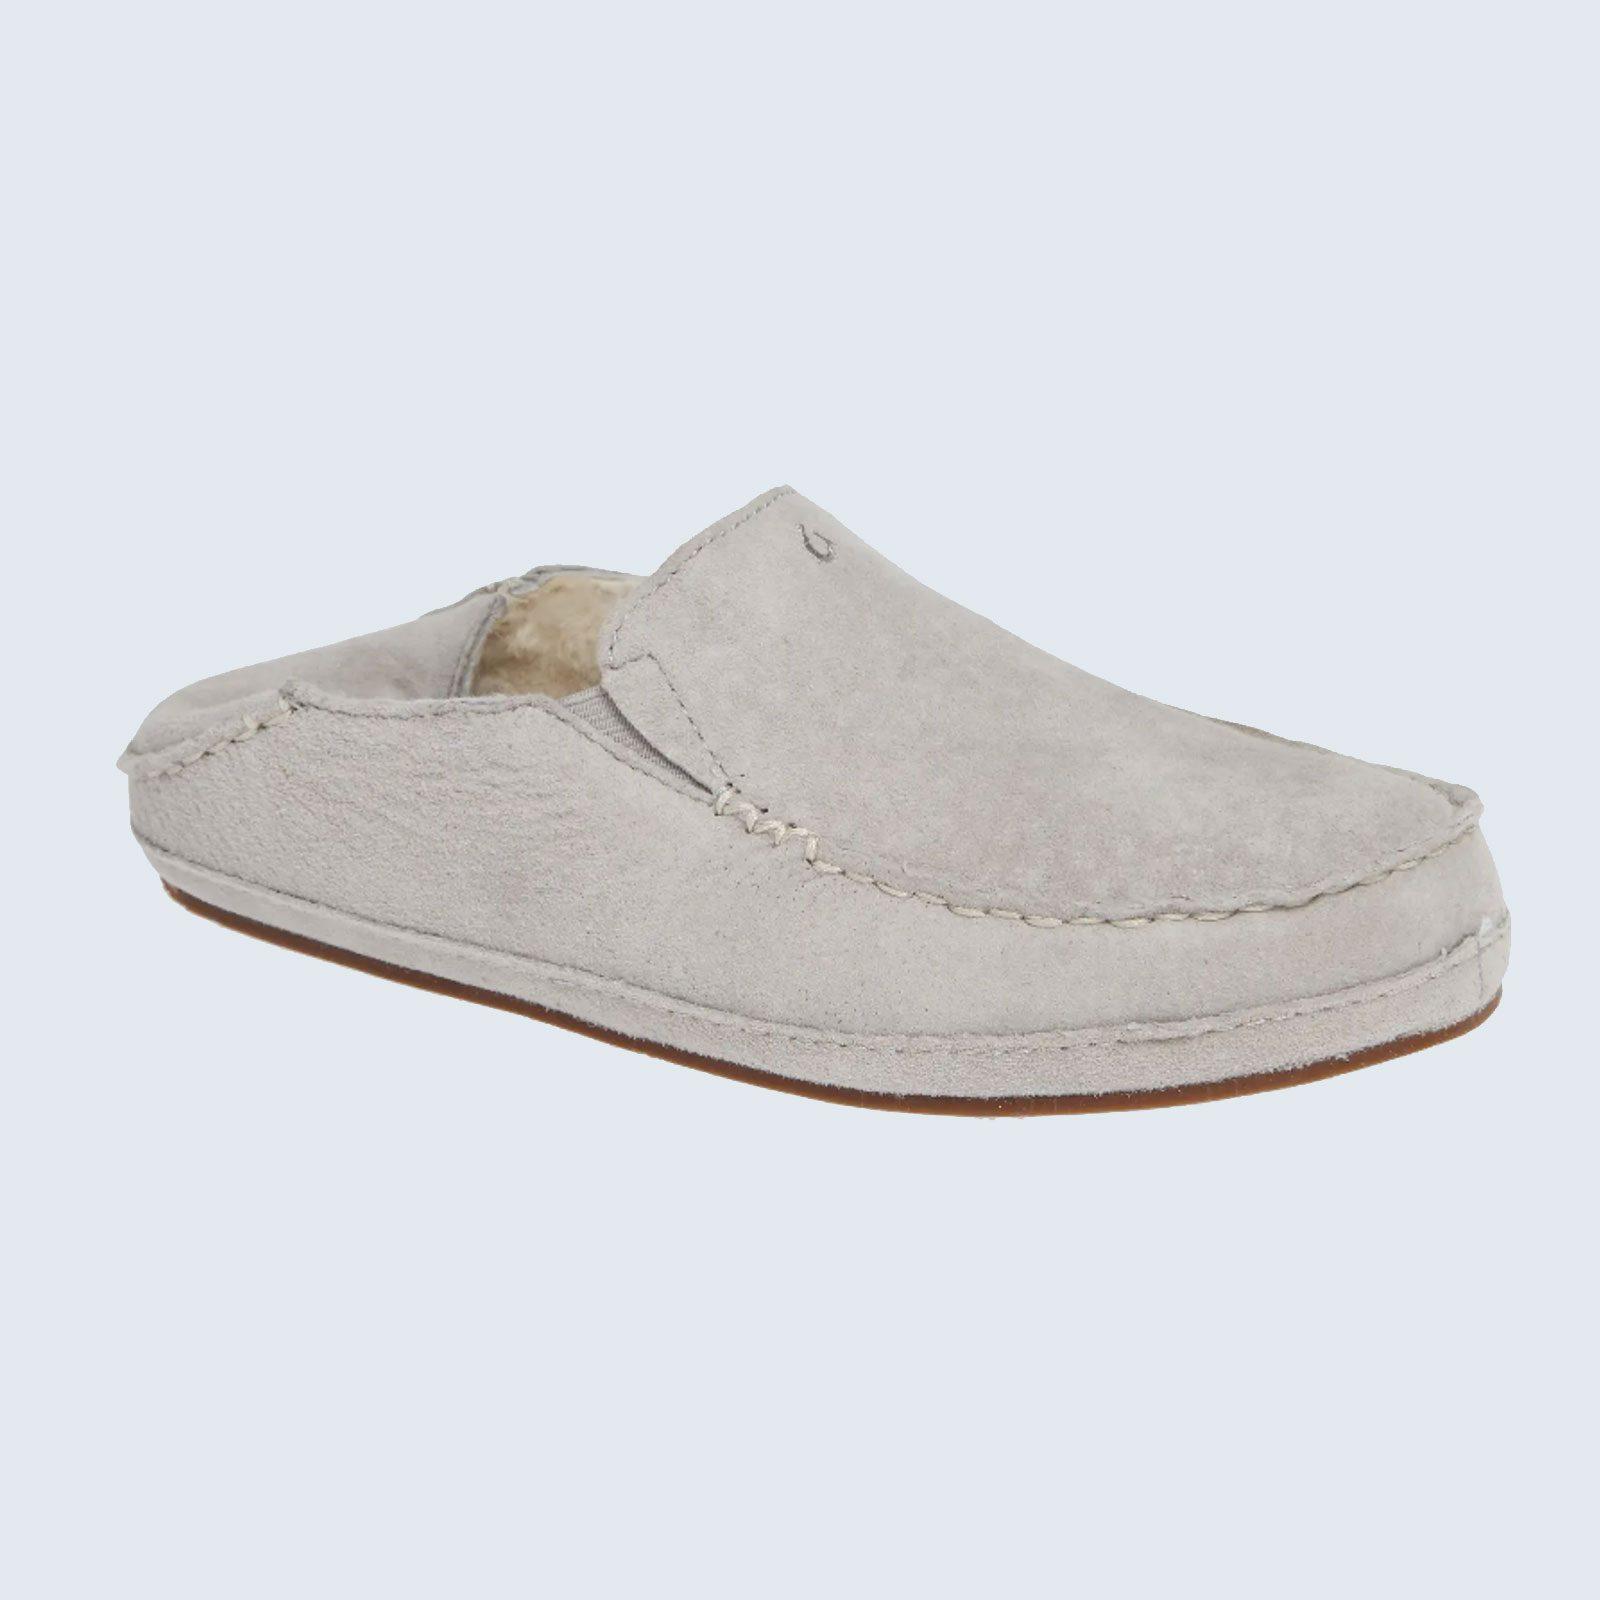 Most versatile slippers: Olukai Nohea Slipper